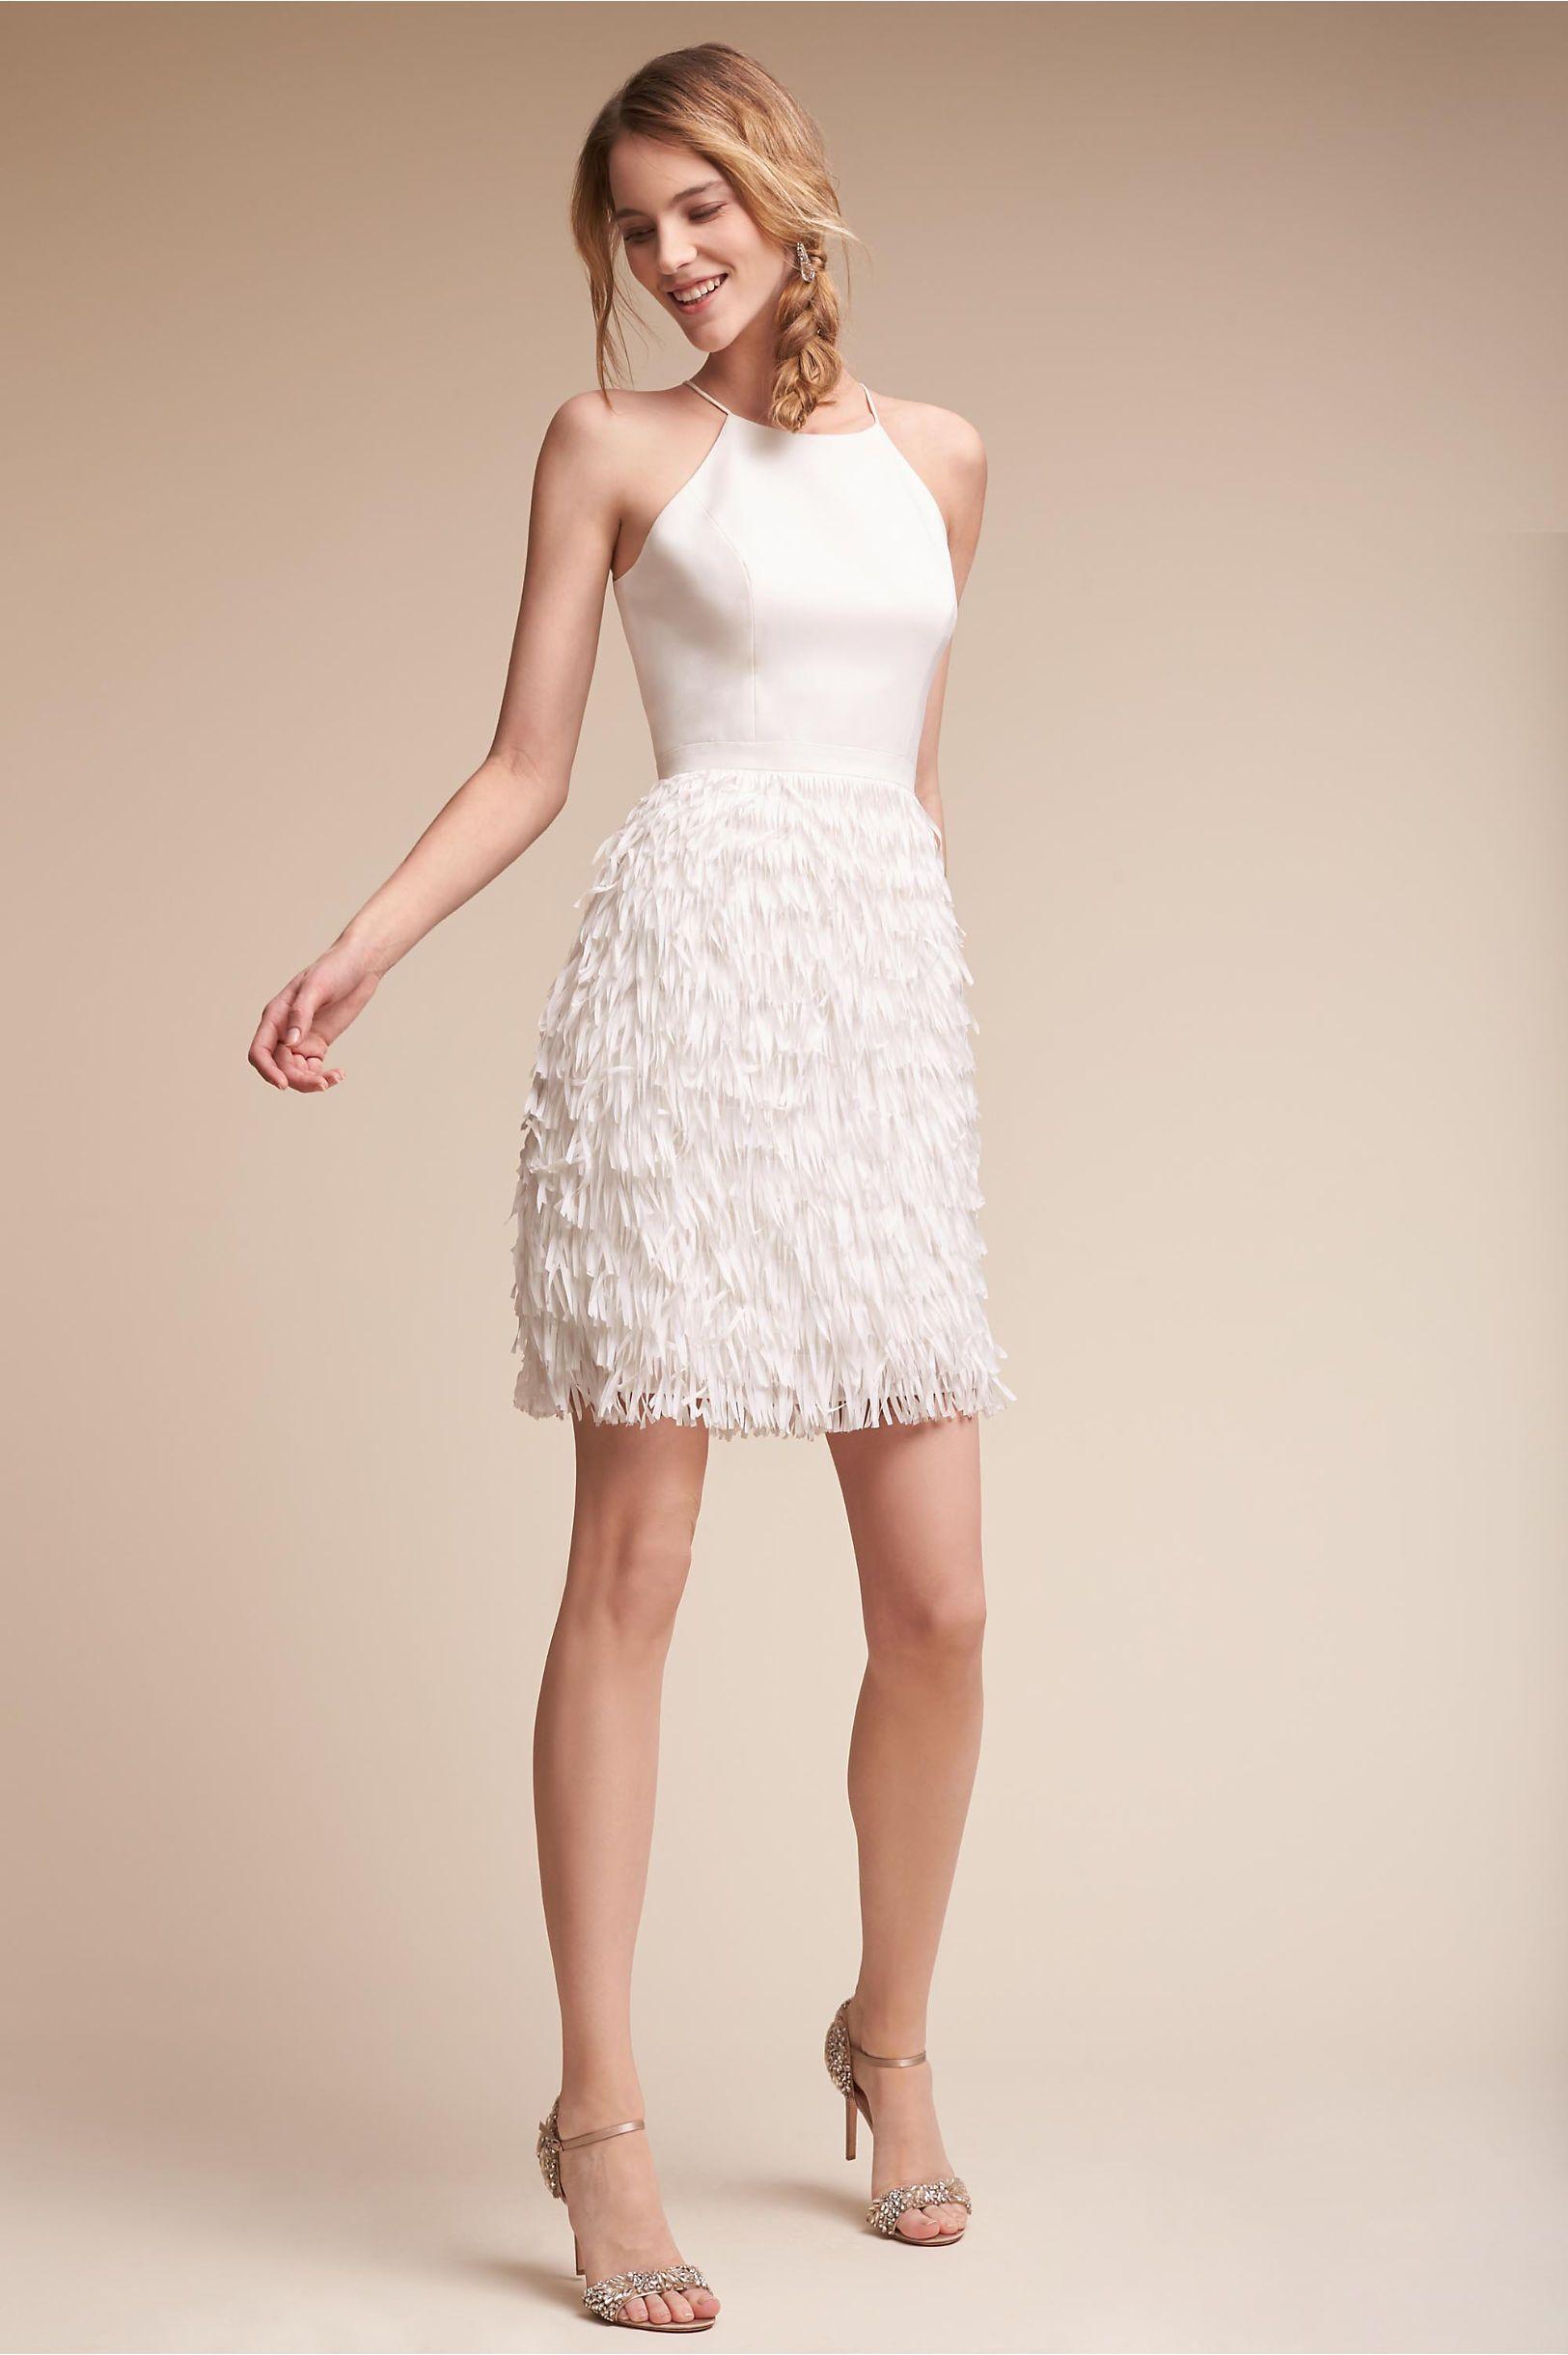 9aee5fa023a1 BHLDN Promenade Dress in Bride Little White Dresses | BHLDN | Aidan ...